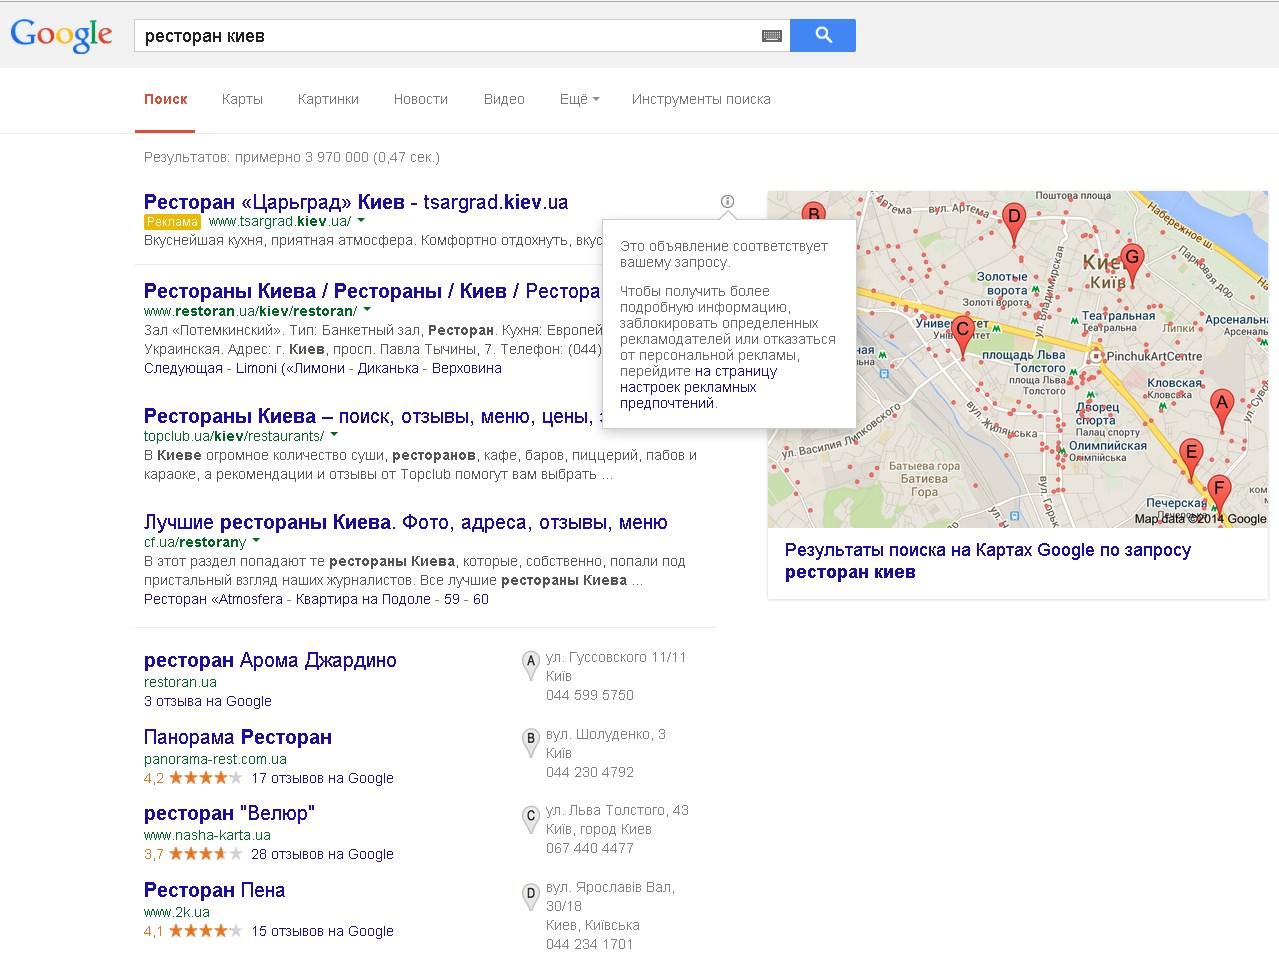 03.Google_Restoran